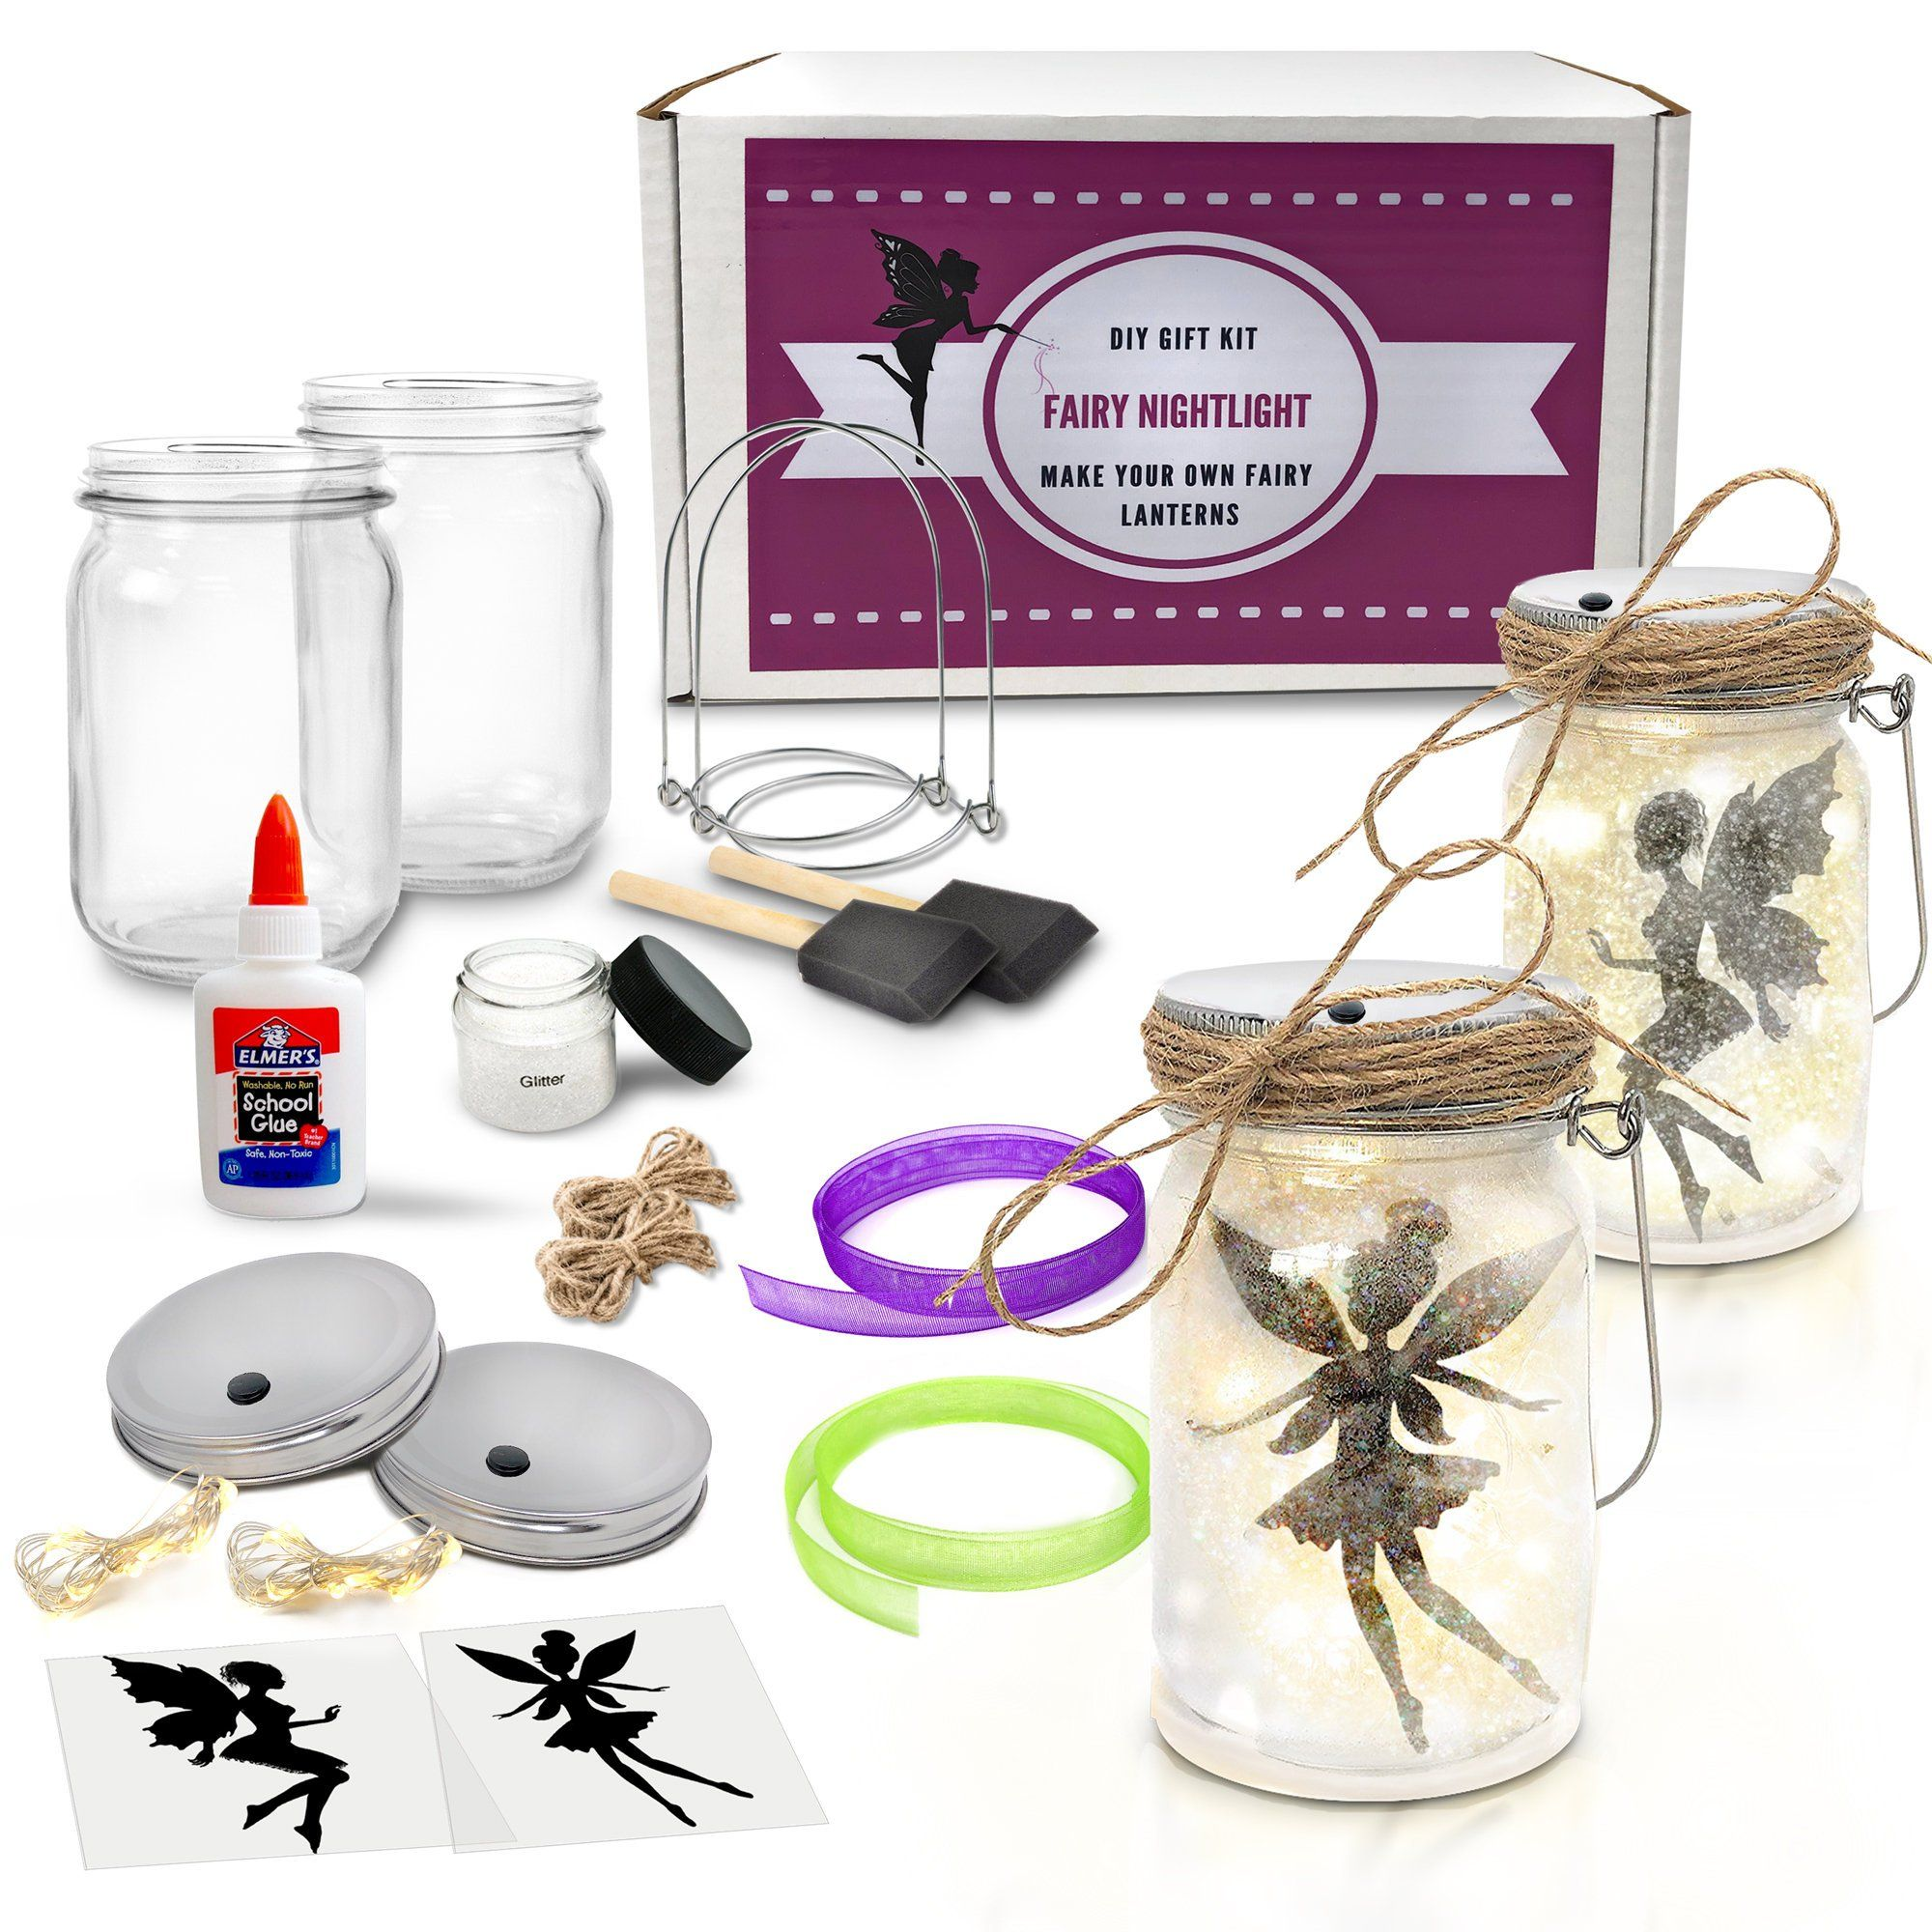 Fairy nightlight lantern craft kit 2 pack diy make